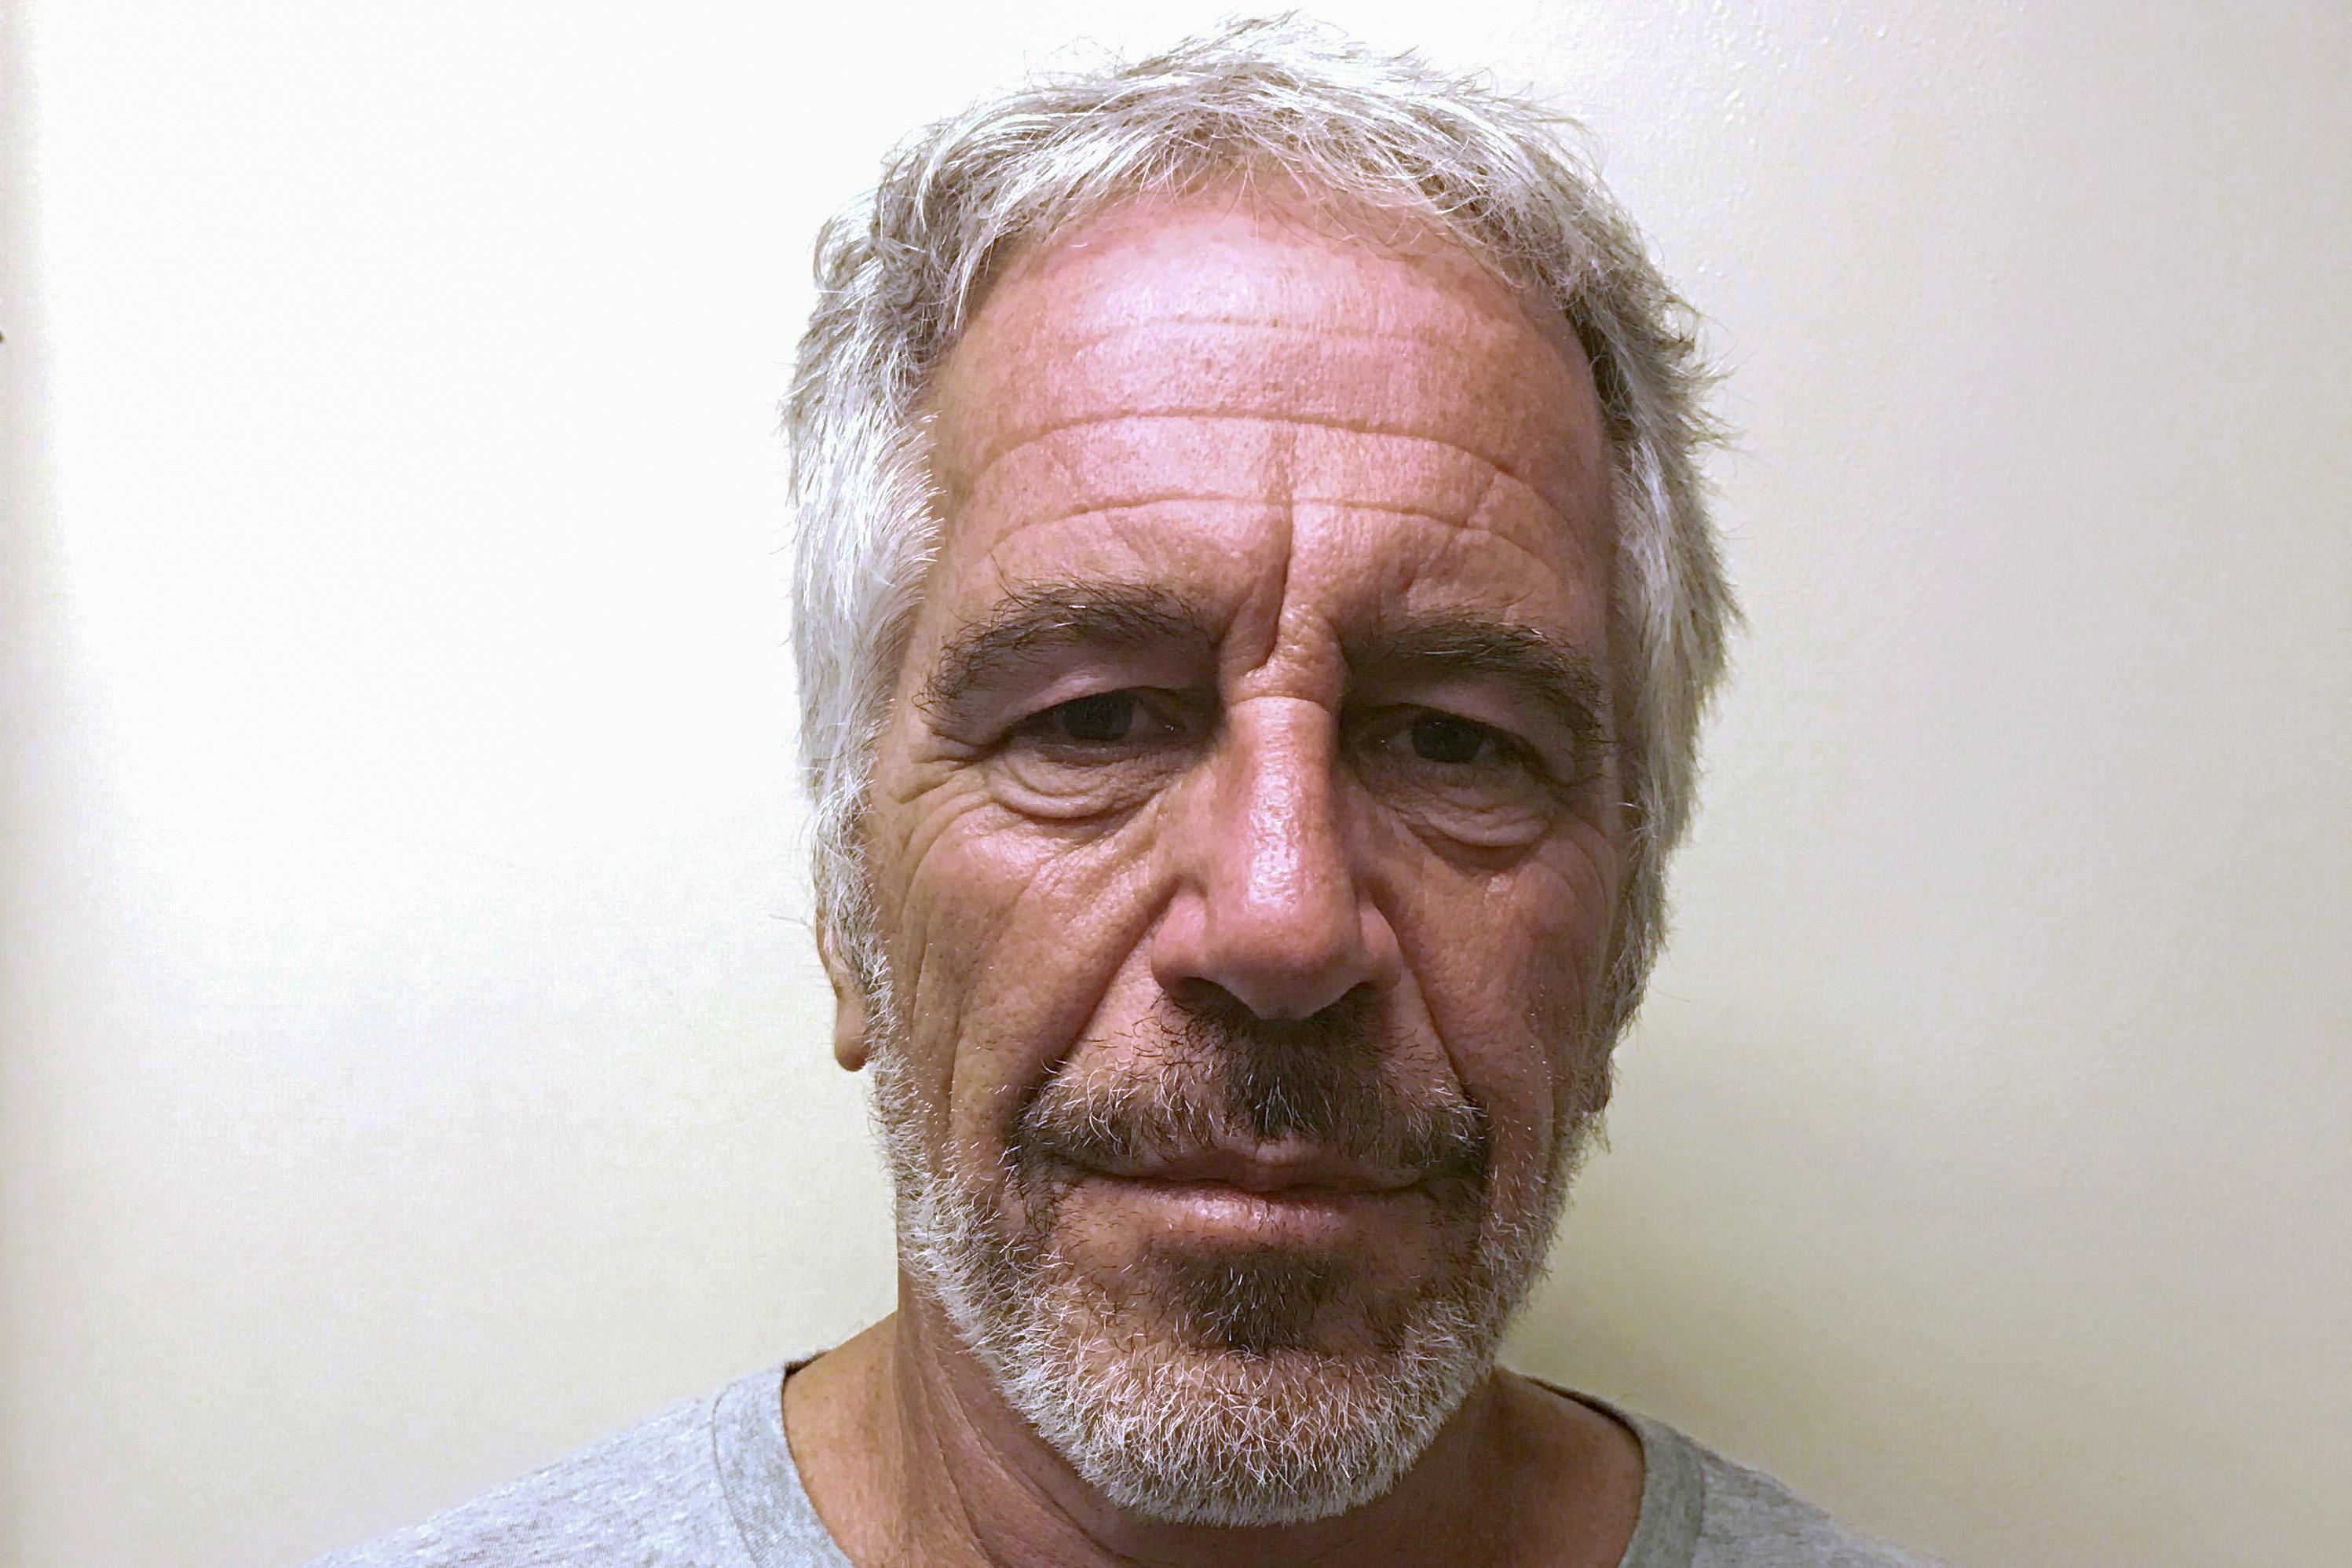 Case against Jeffrey Epstein dismissed following his death